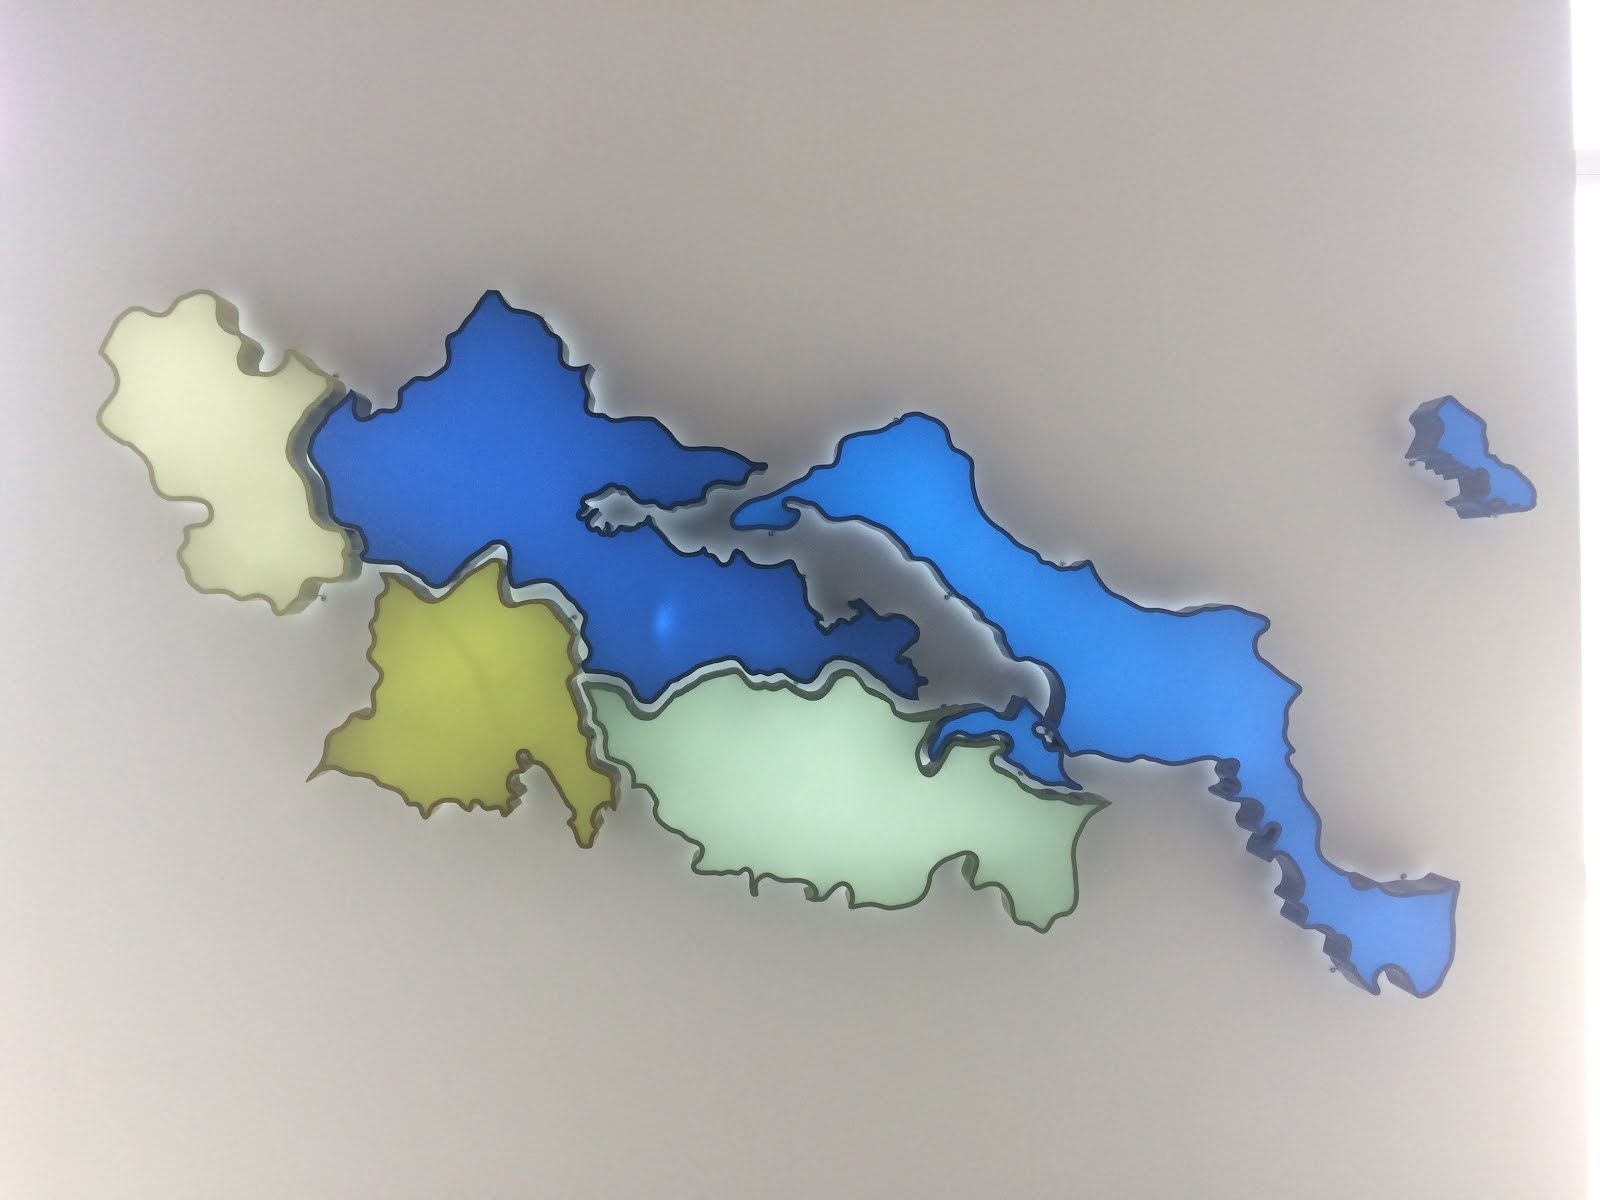 On line έρευνα για την Περιφέρεια της Στερεάς Ελλάδας